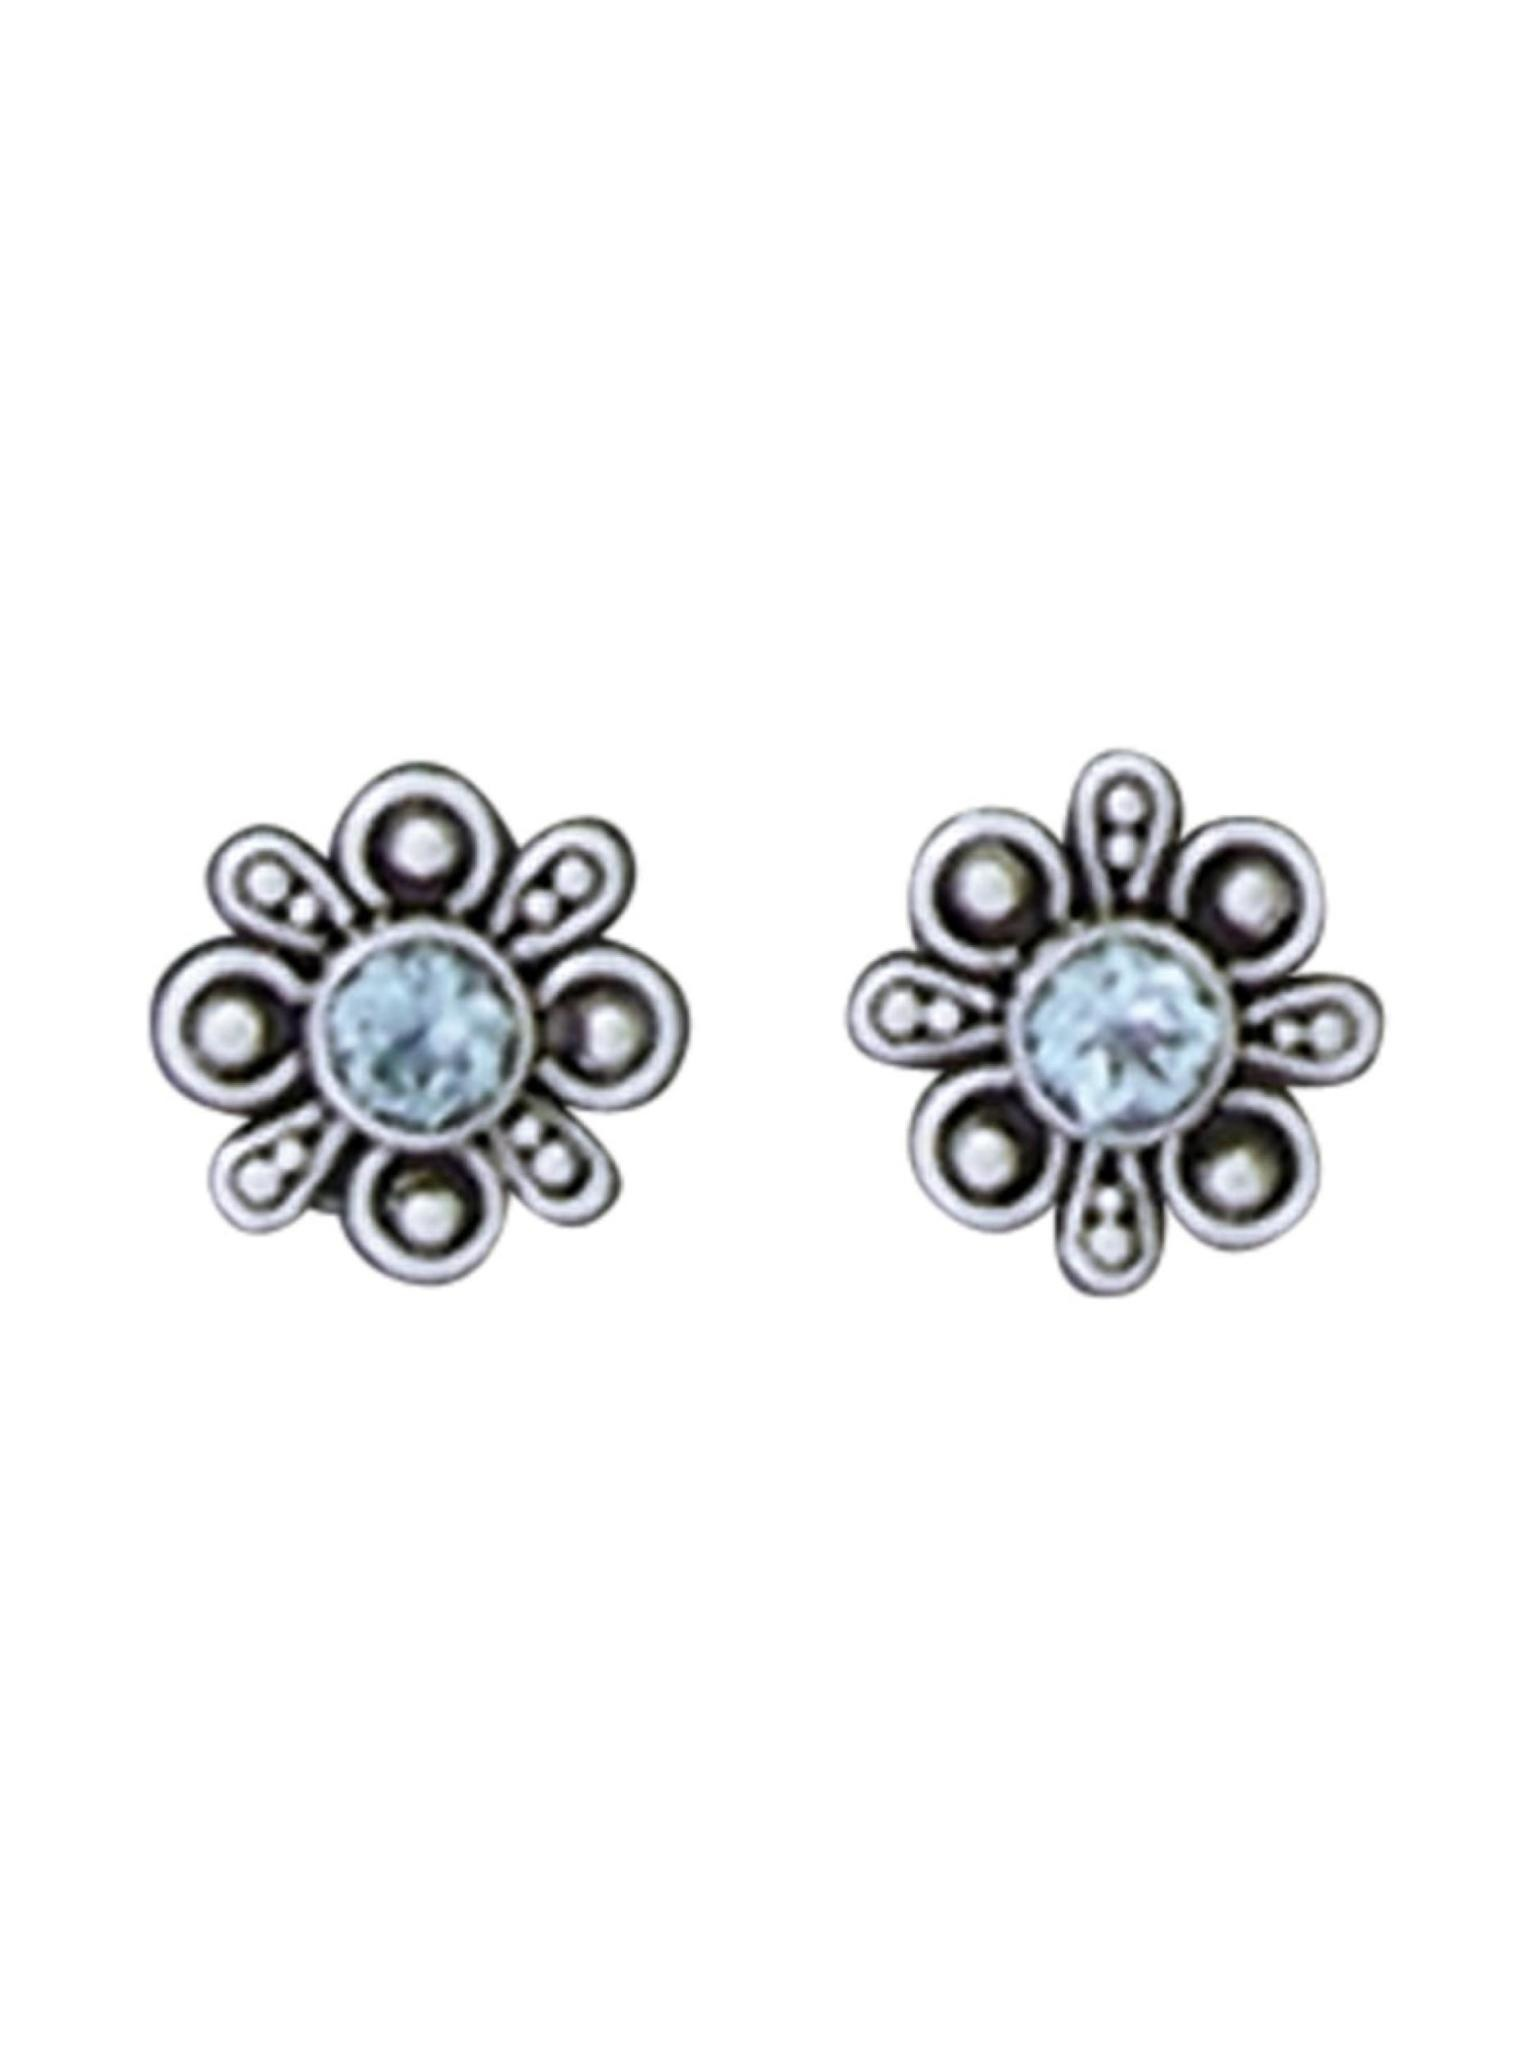 Acomo Jewelry Sky Blue Topaz in Frame Stud Earring